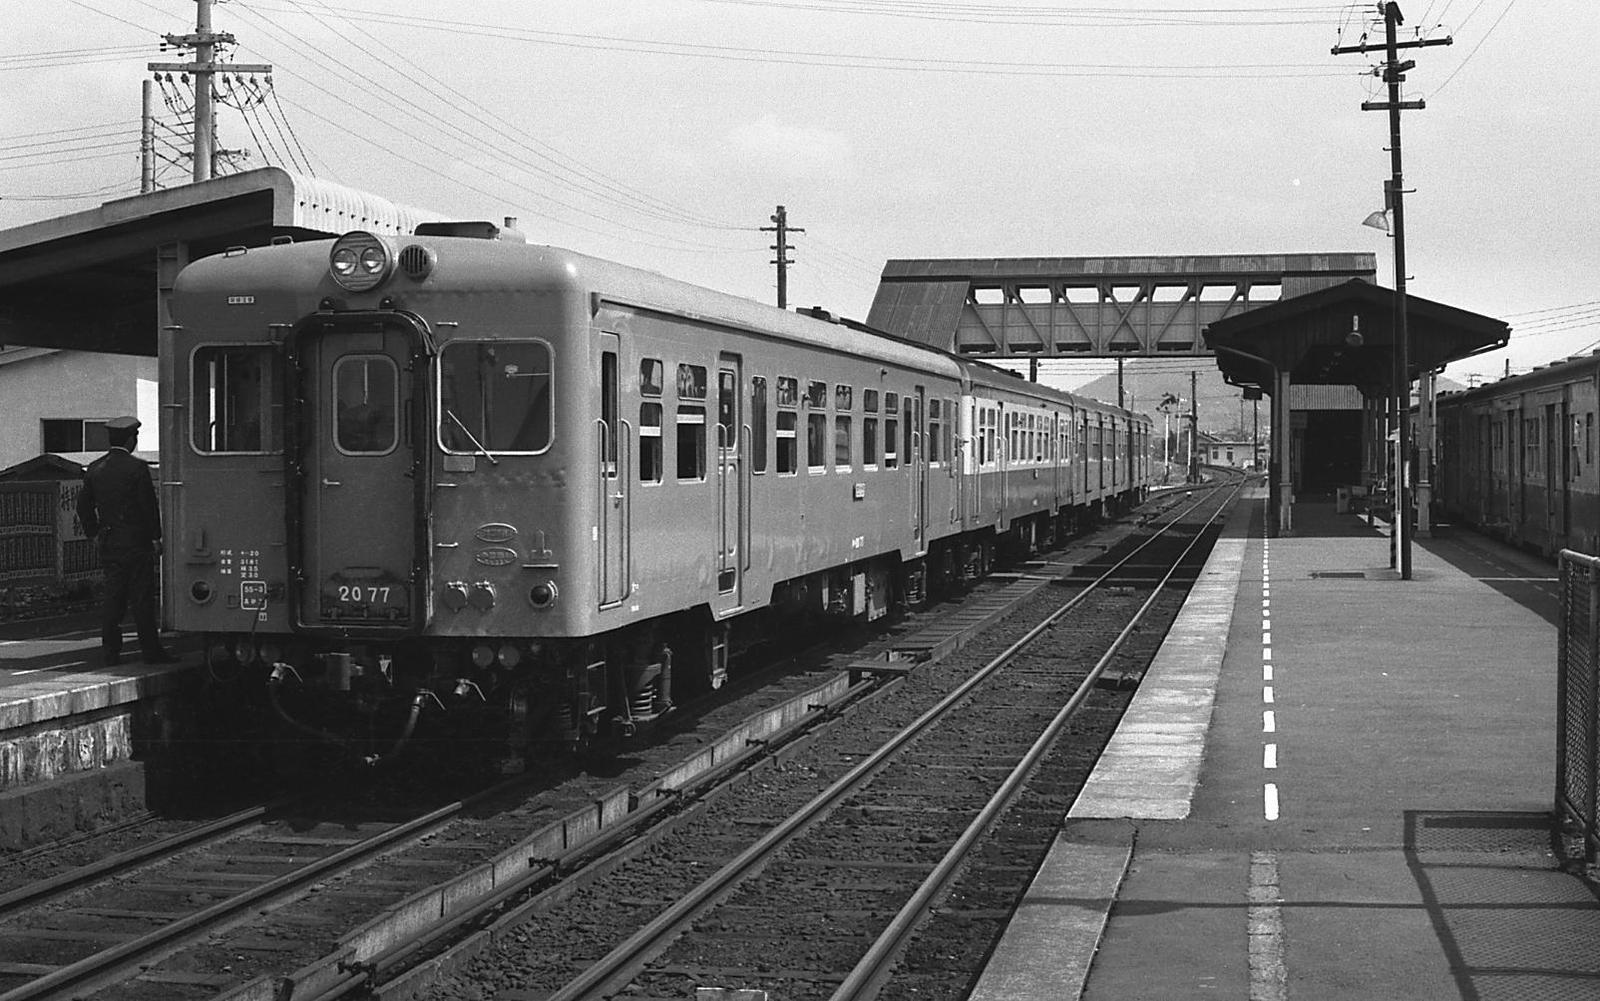 19800408b12